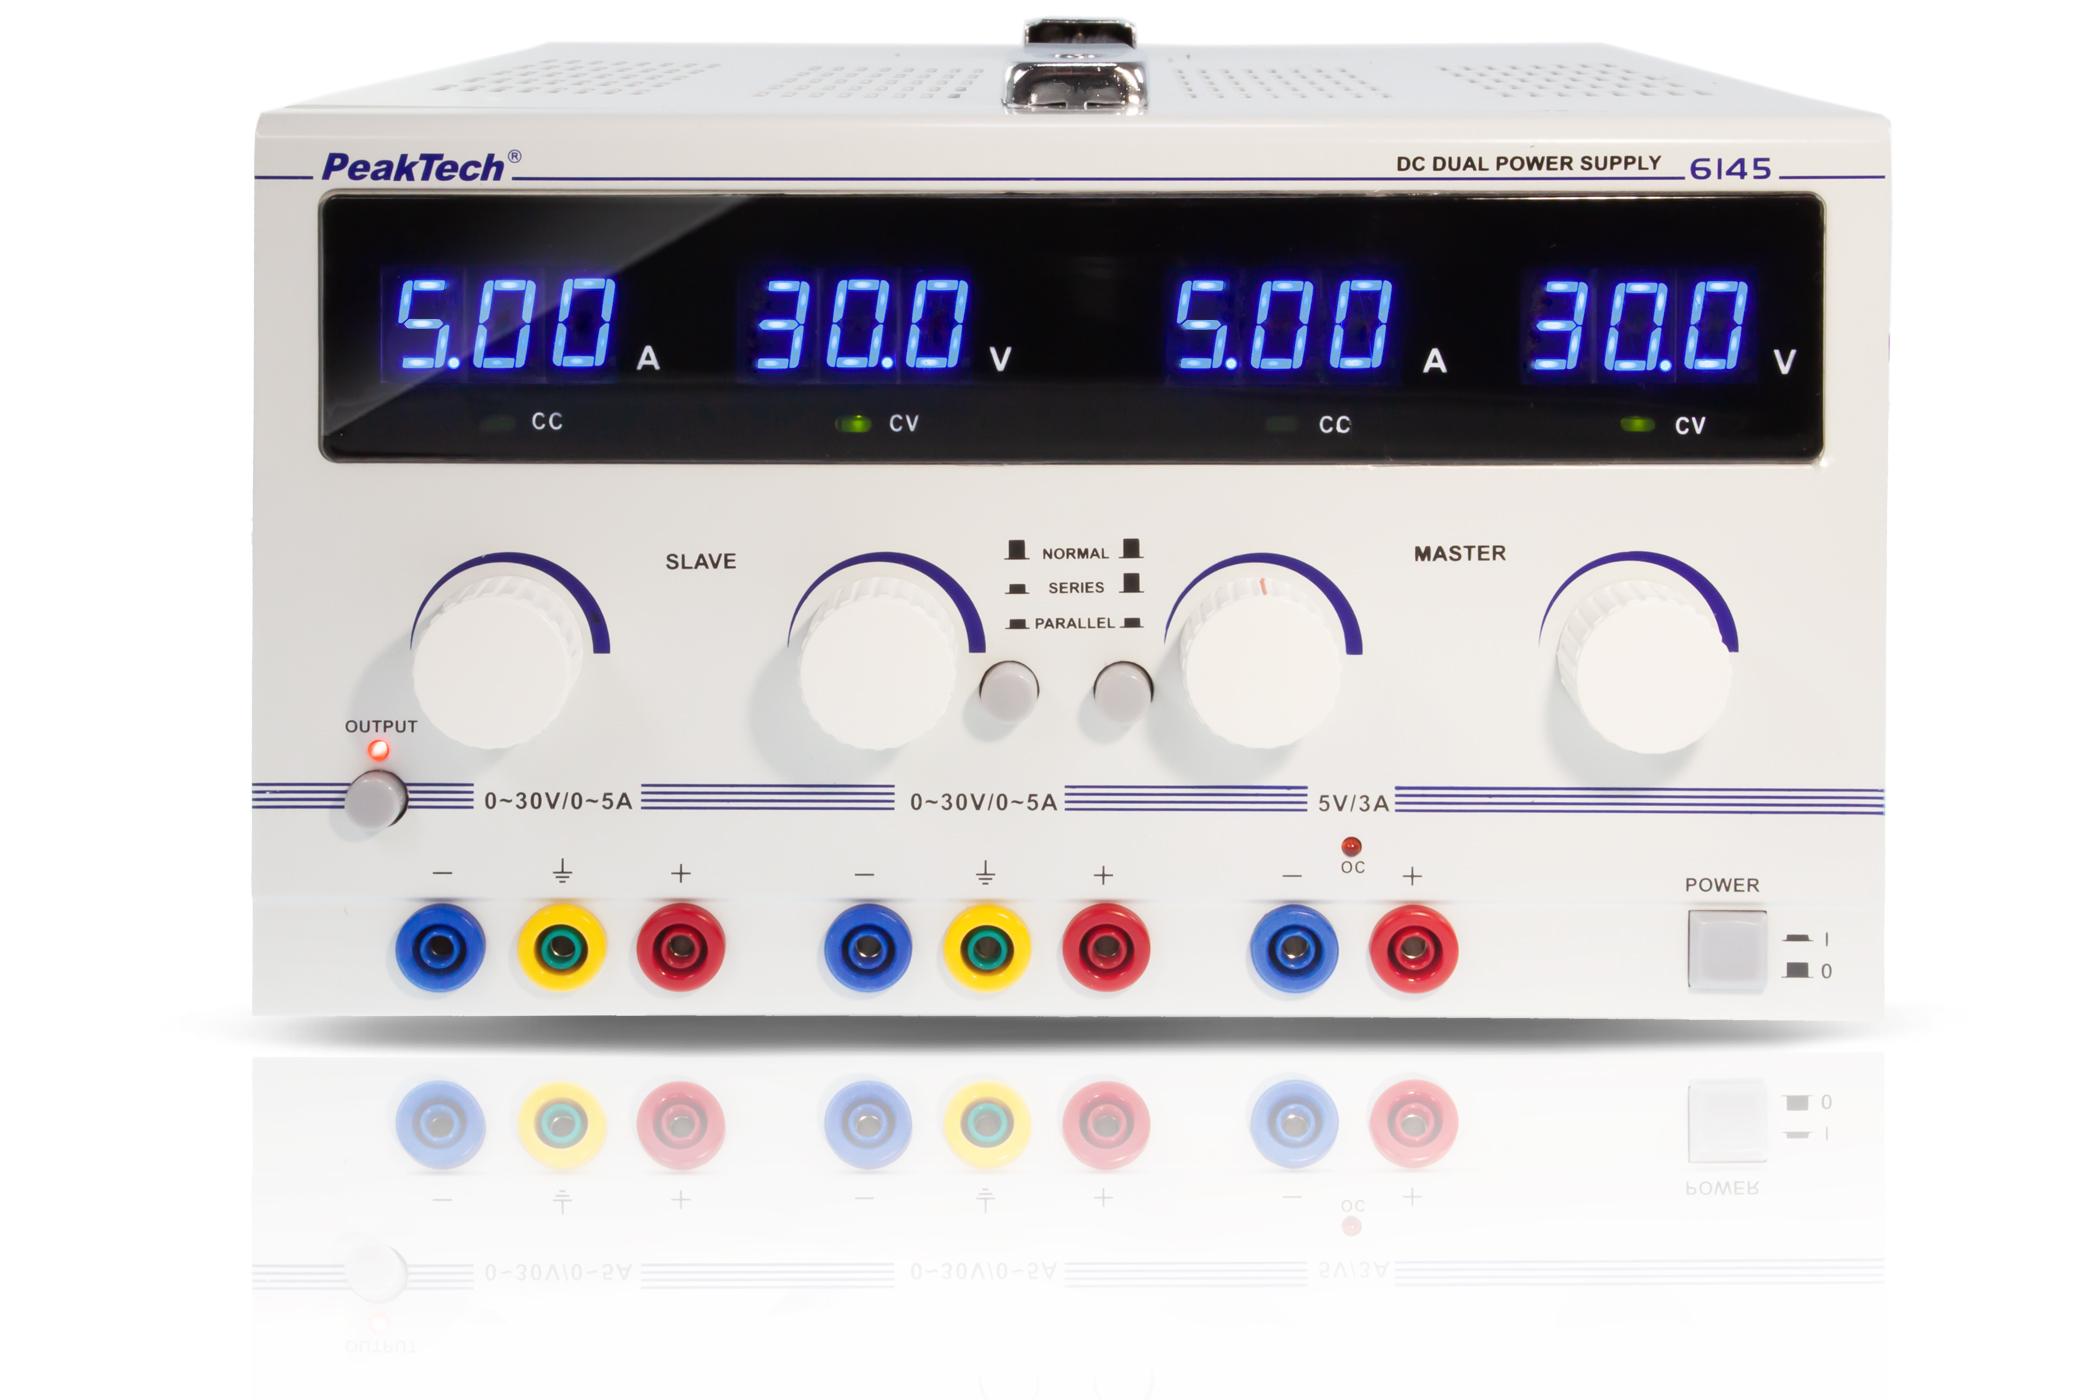 «PeakTech® P 6145» Digital Laboratory Power Supply